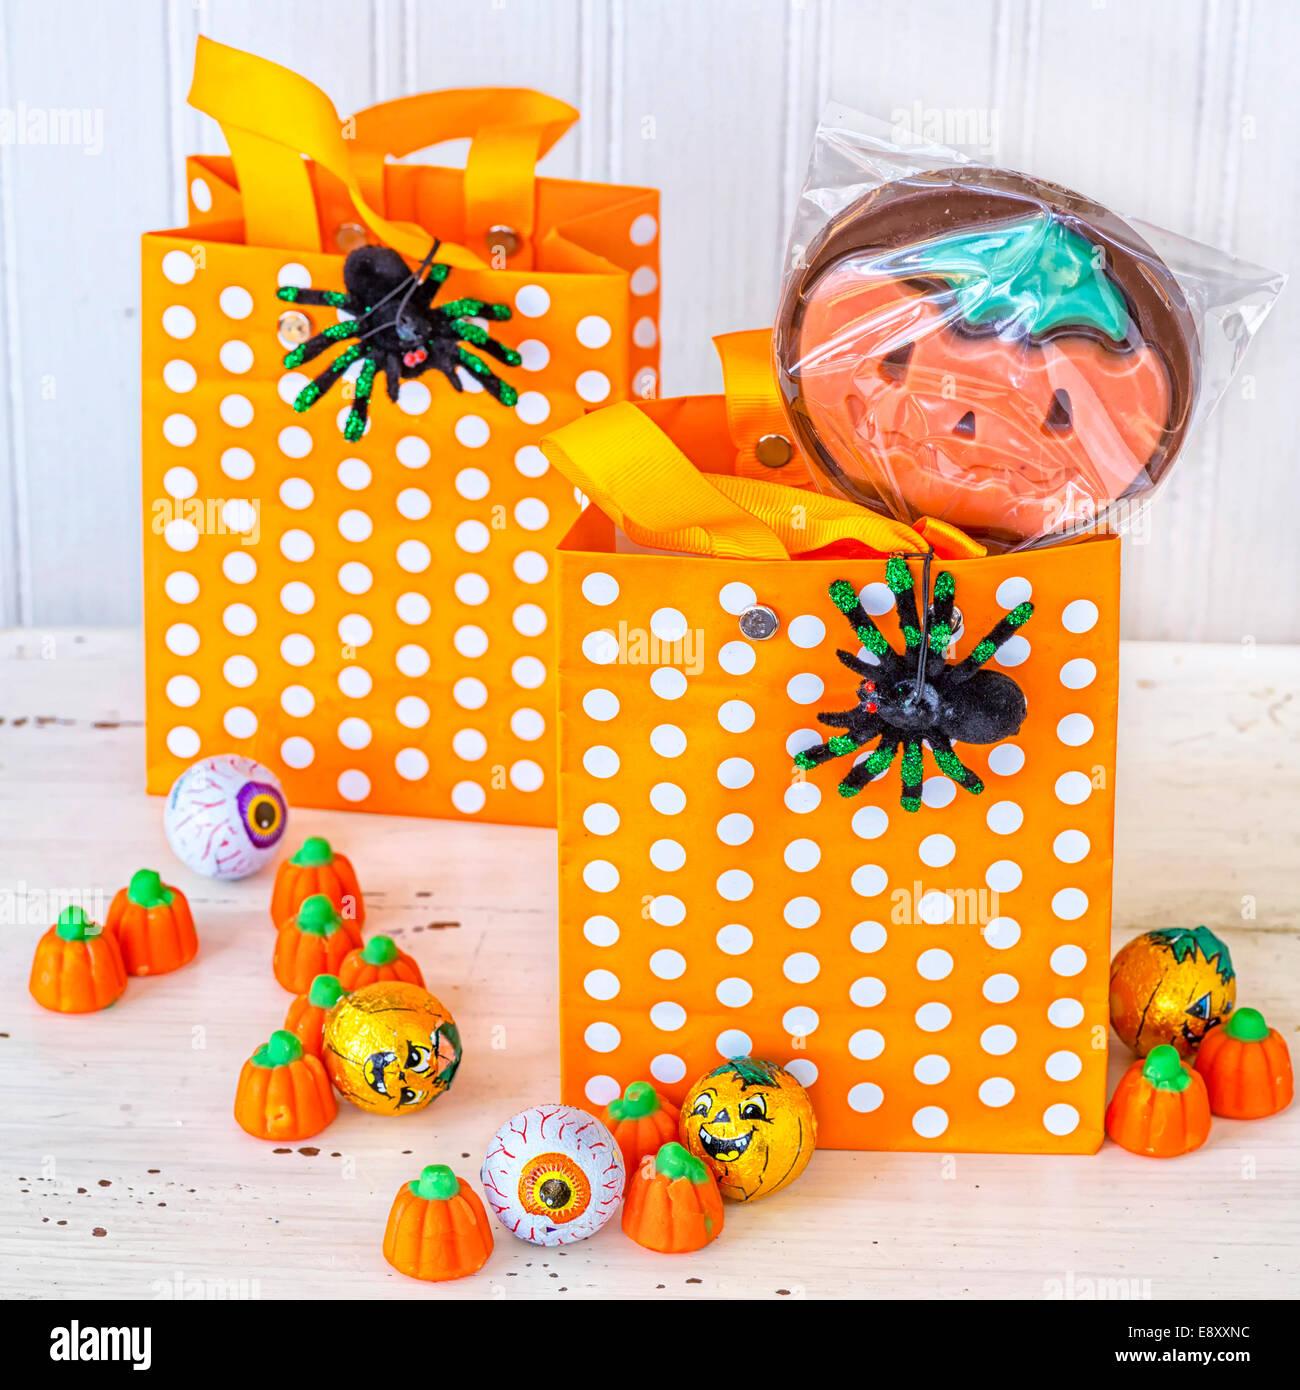 Halloween Candy Bag Stockfotos & Halloween Candy Bag Bilder - Alamy